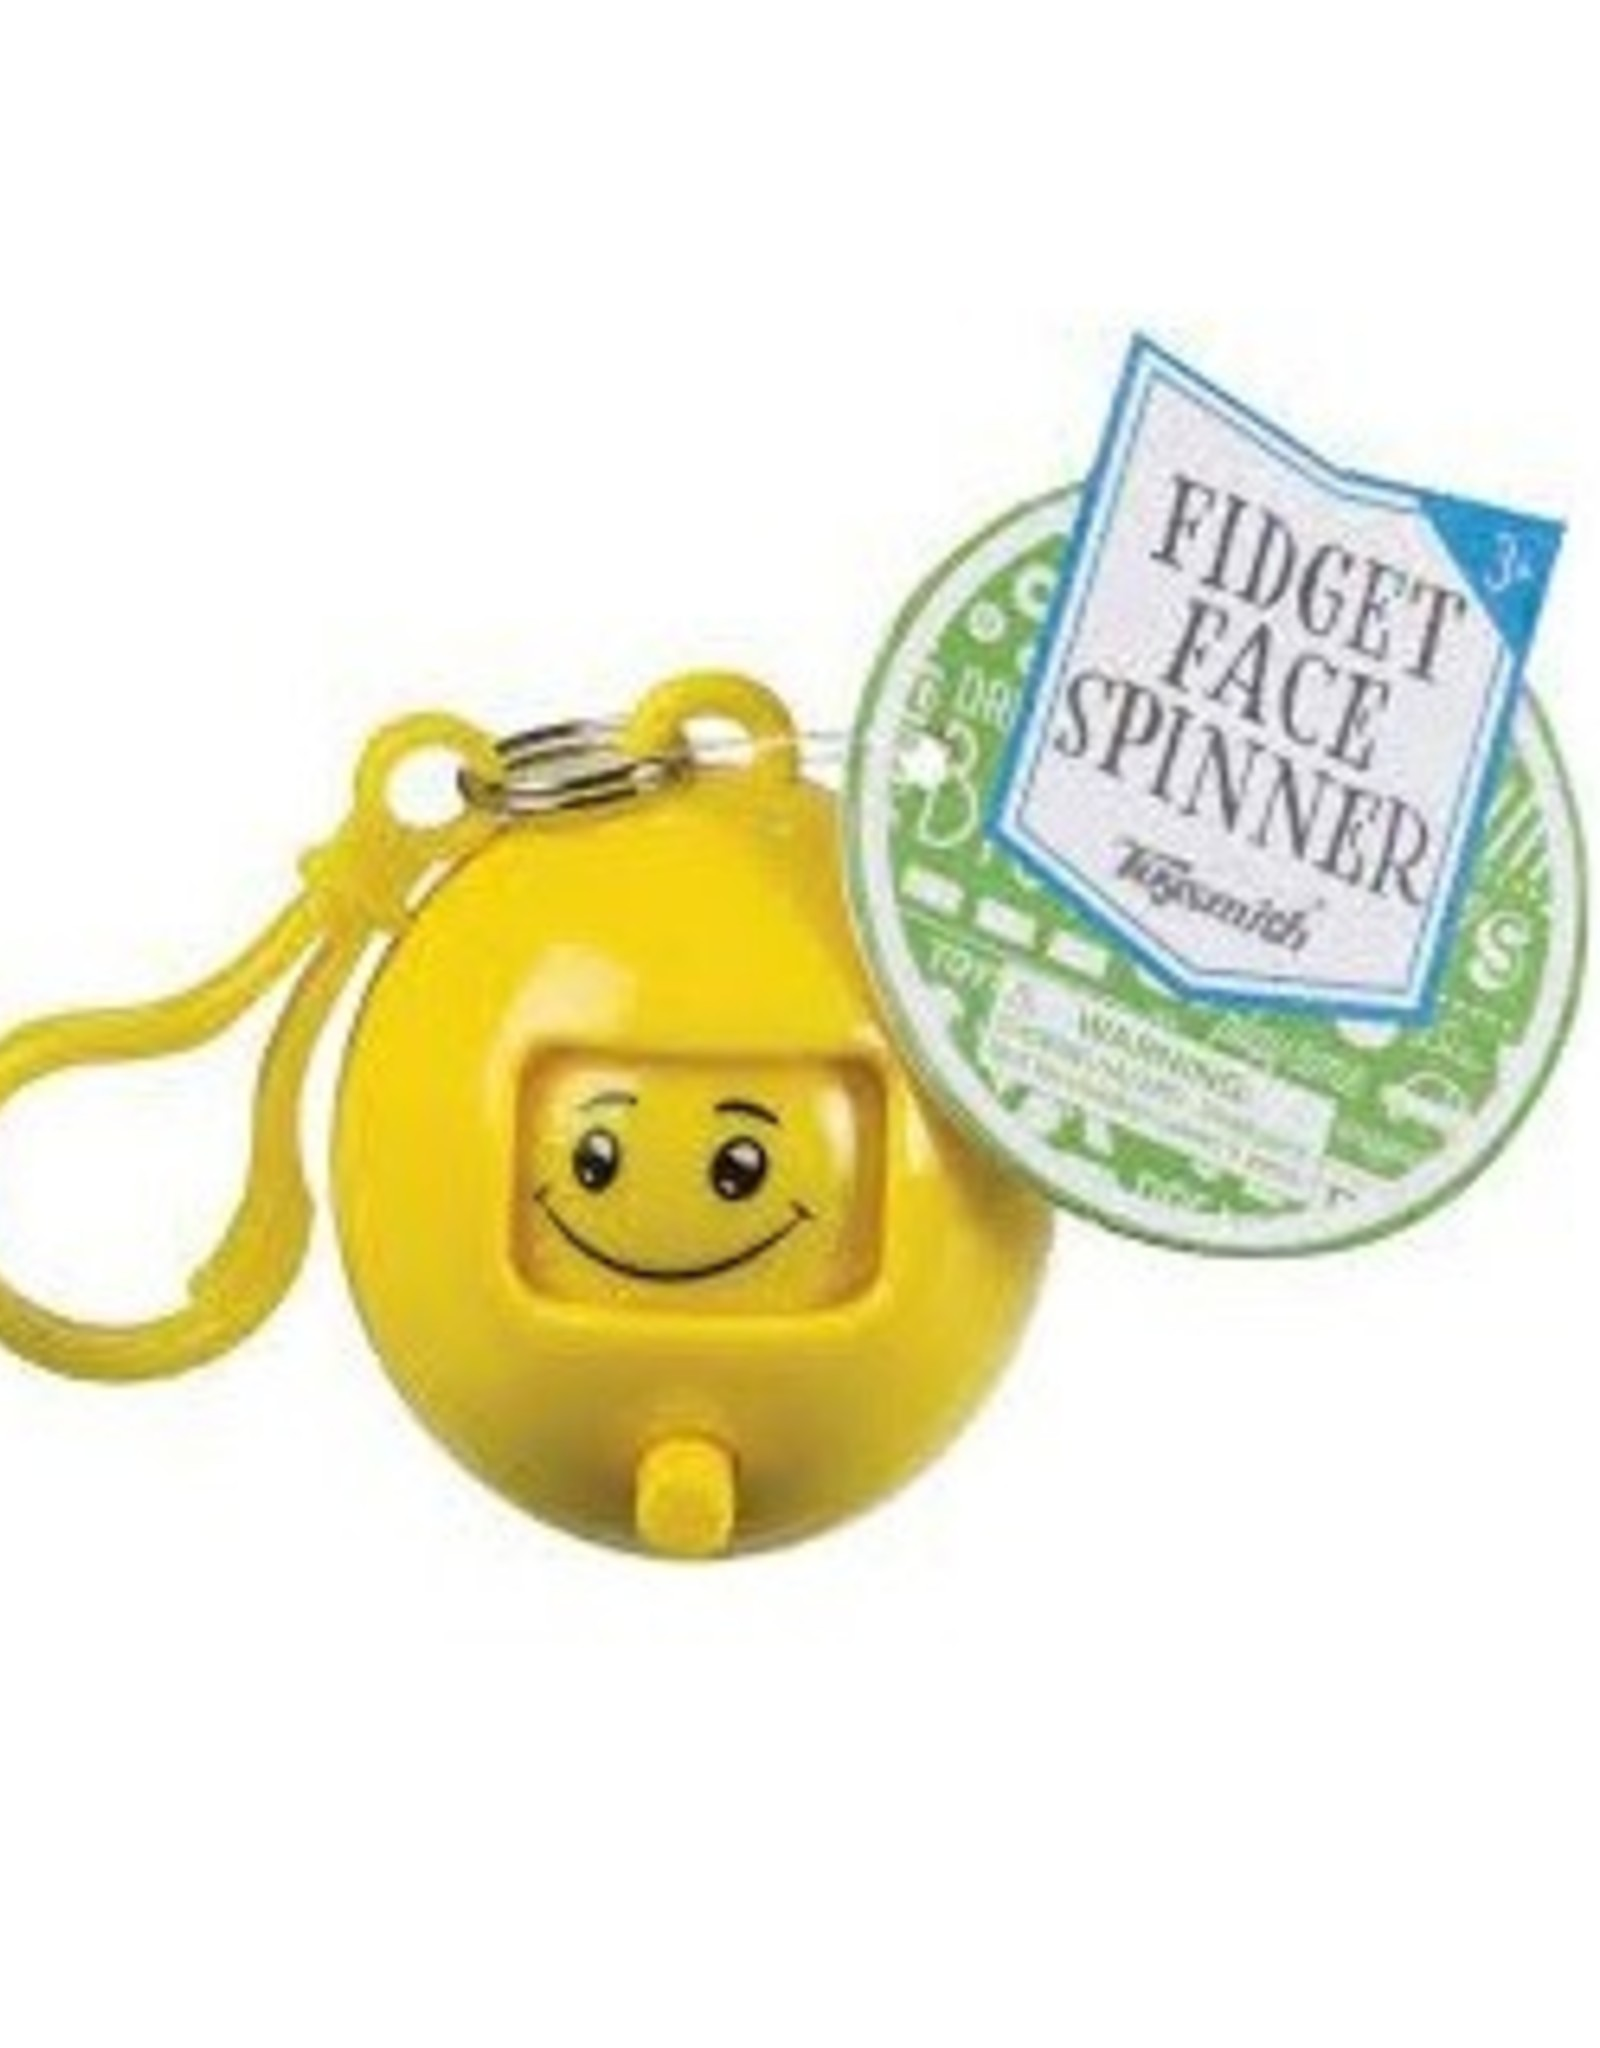 Toysmith Fidget Face Spinner